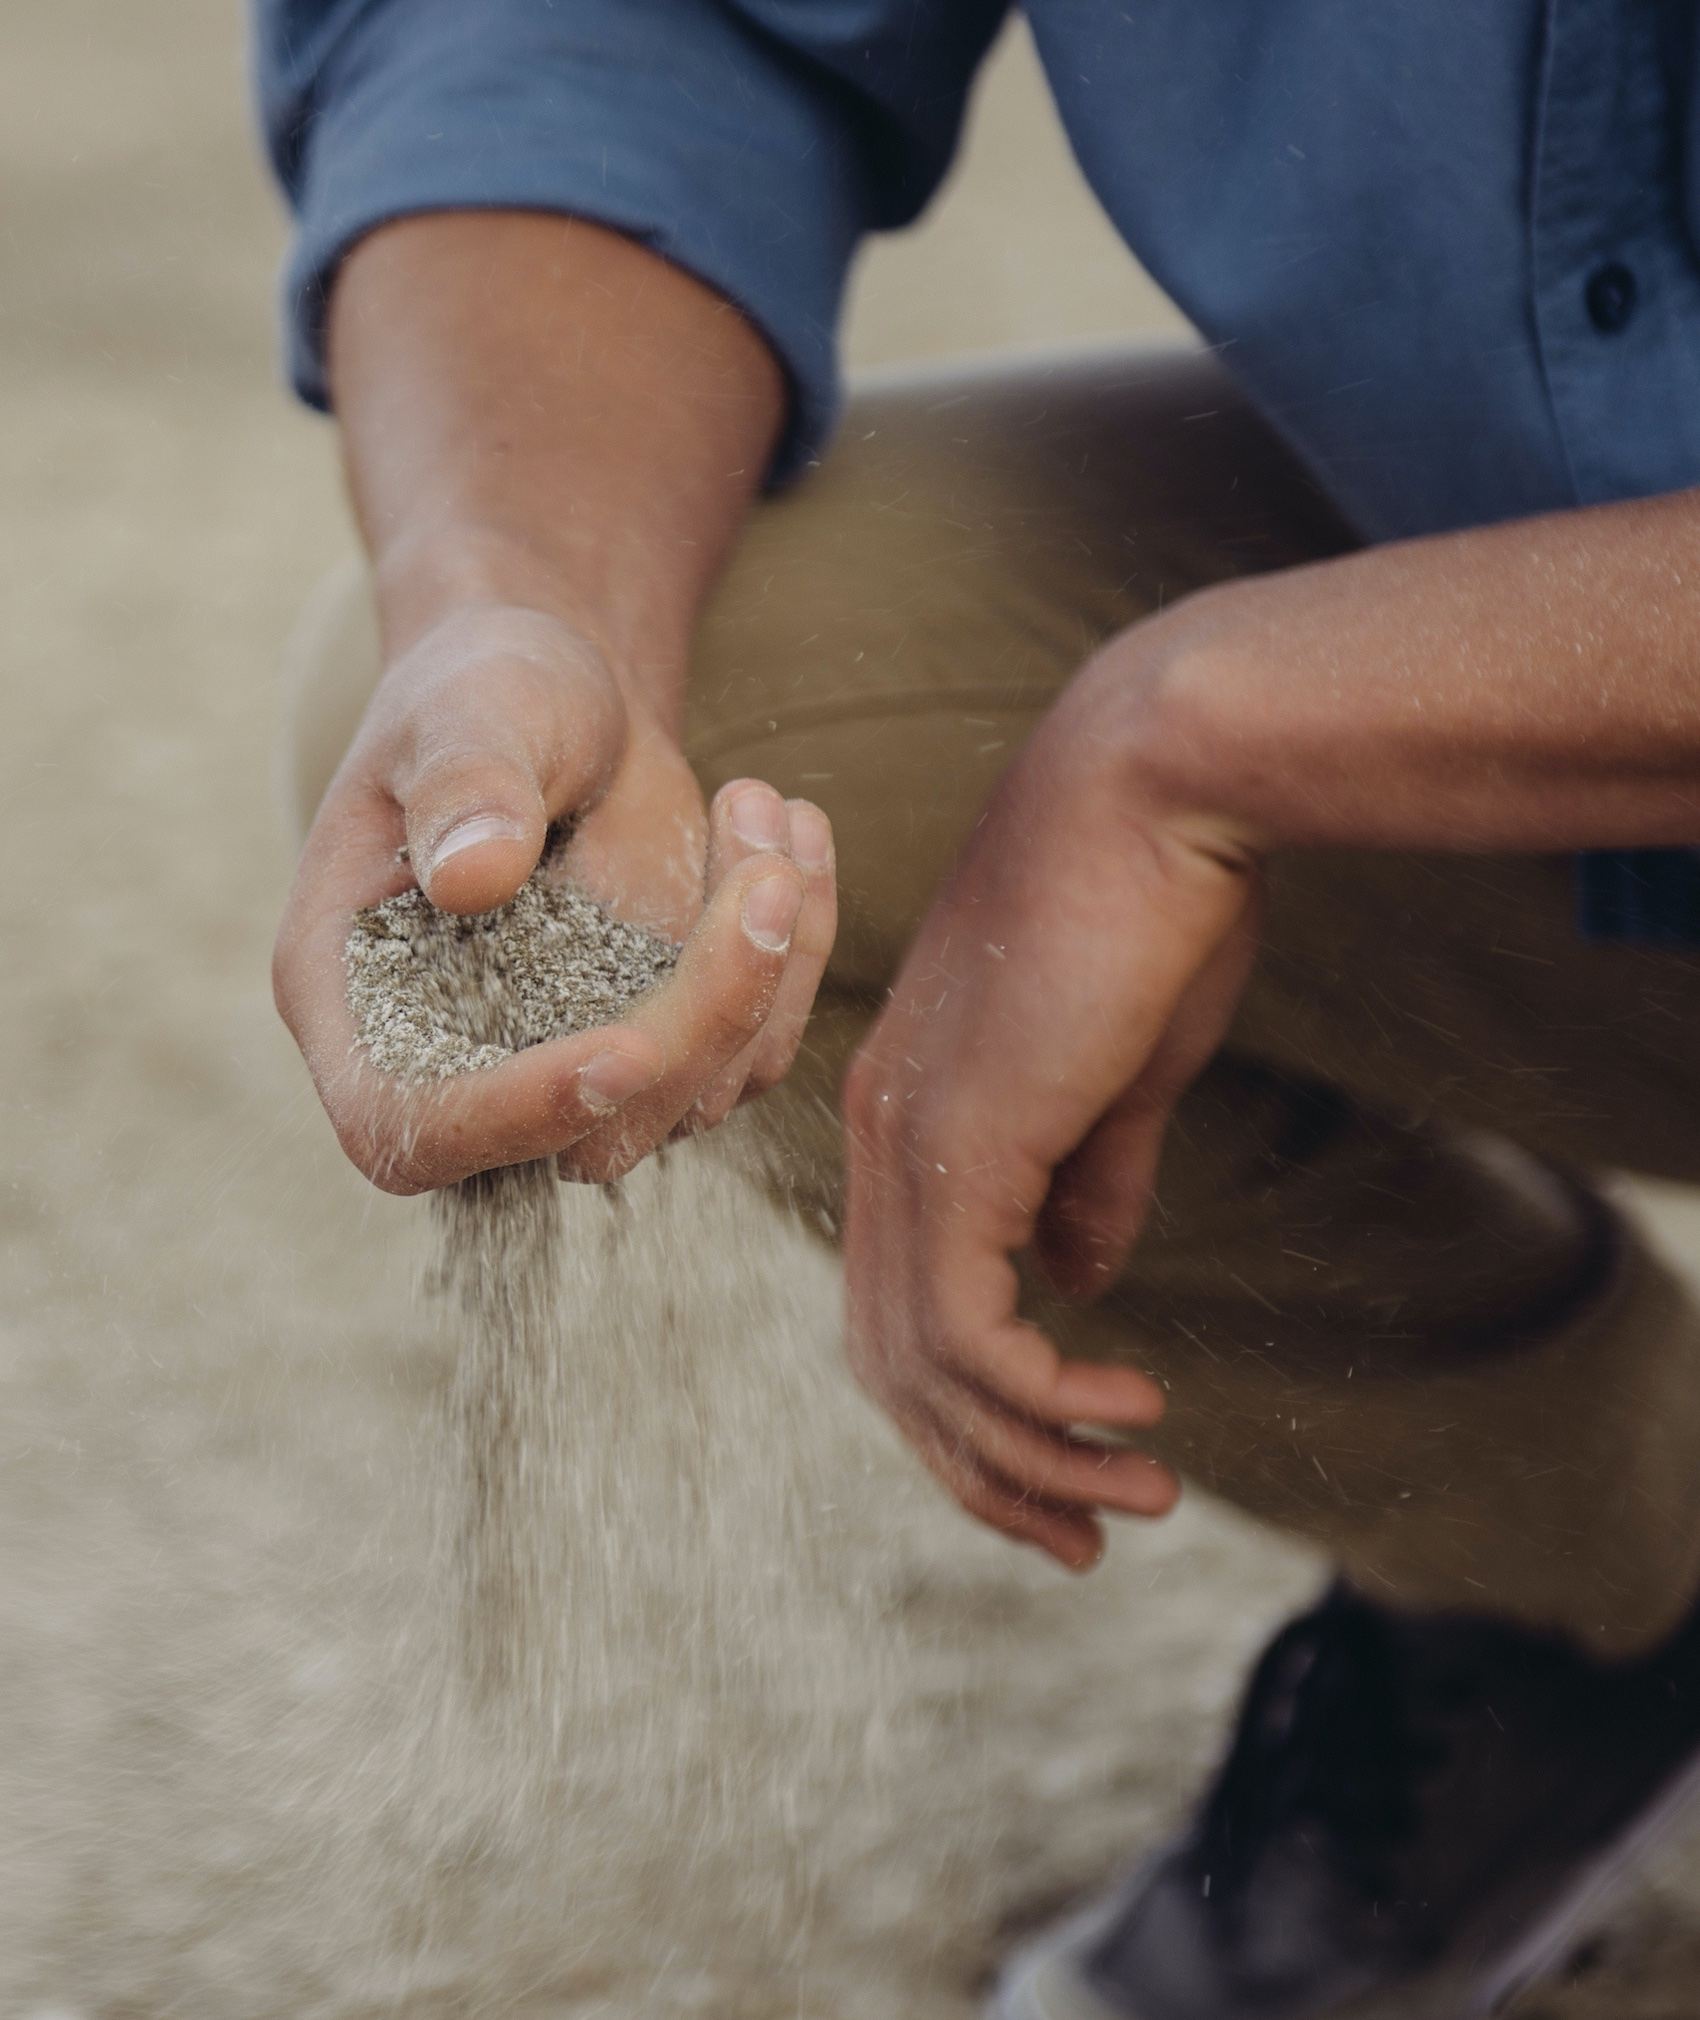 hand holding dirt